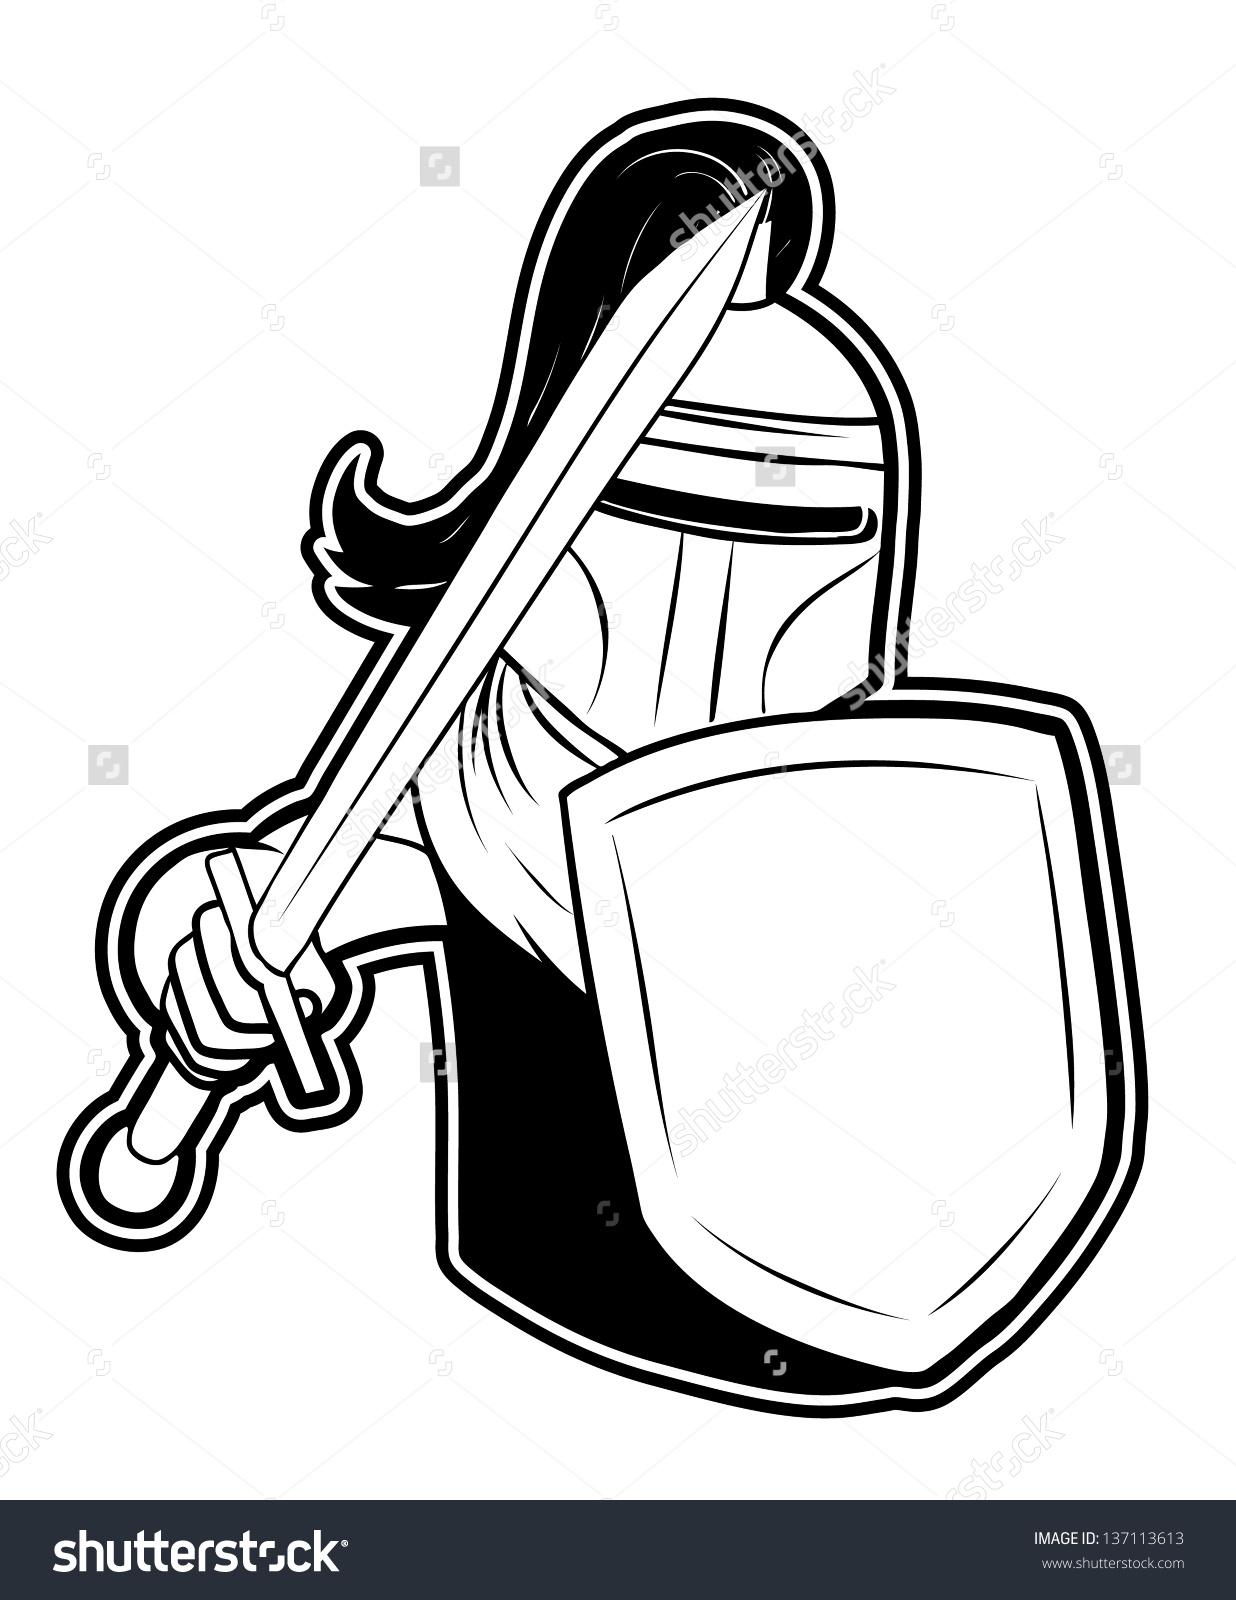 Similiar Black And White Knight Keywords.